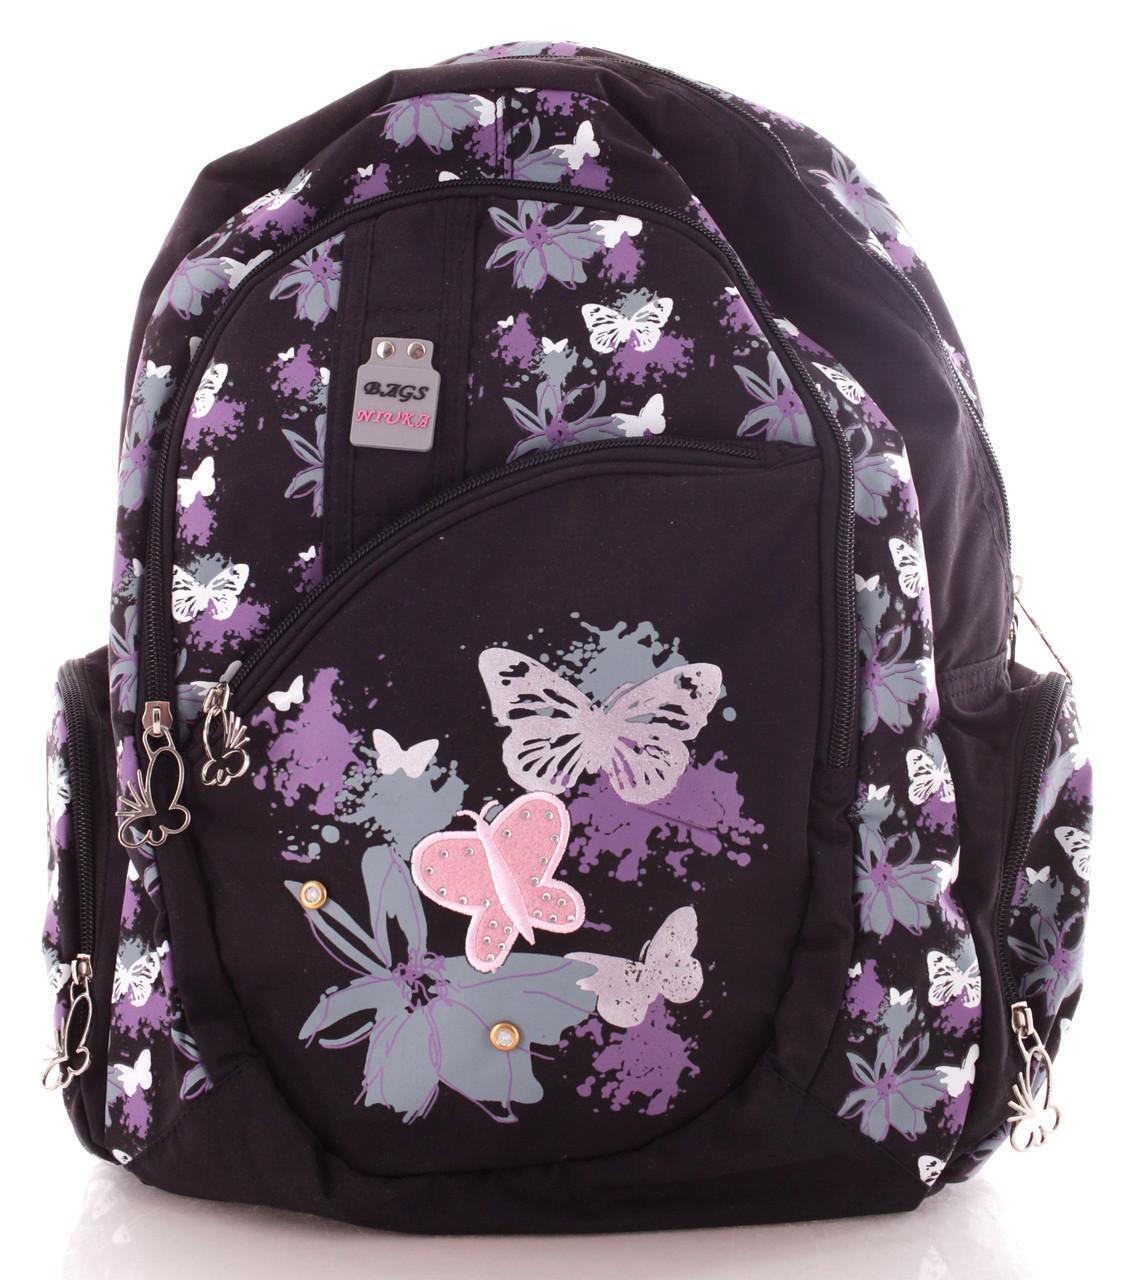 Яркий рюкзак Bag and backpack flowers, бабочки 15 л